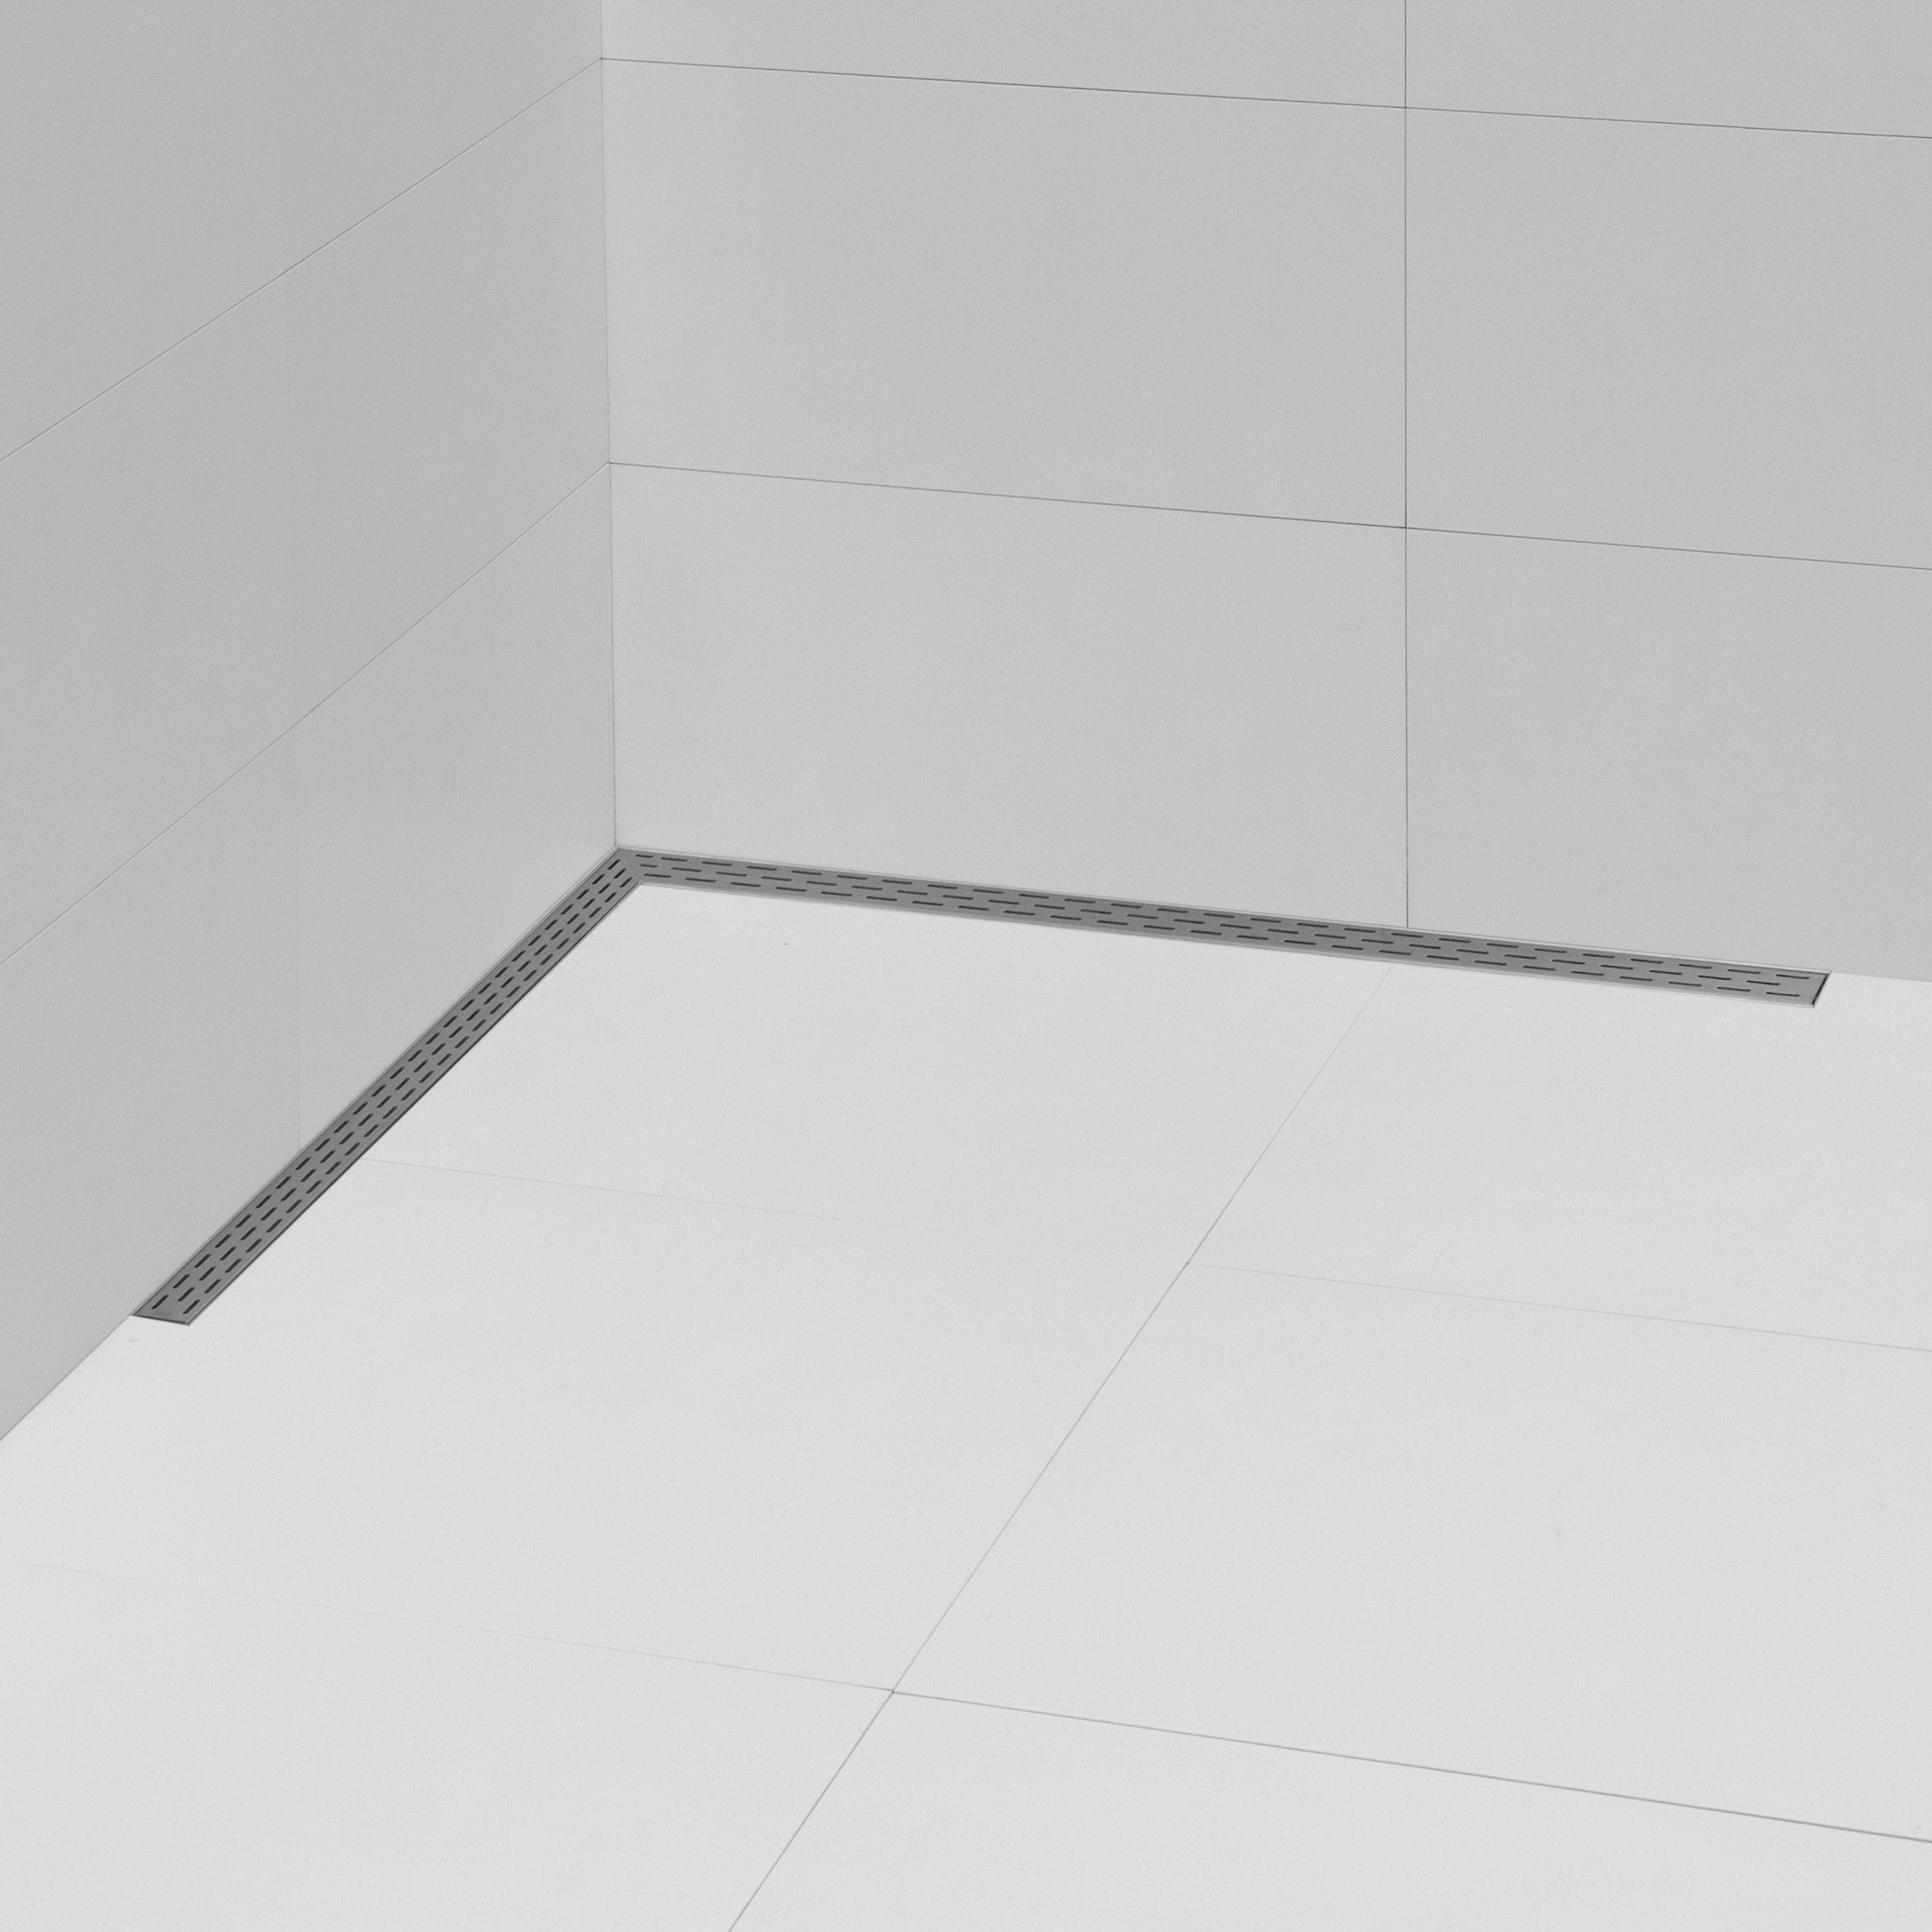 Easy Drain | Specials Square Flex Class | Linear Shower Drain ...